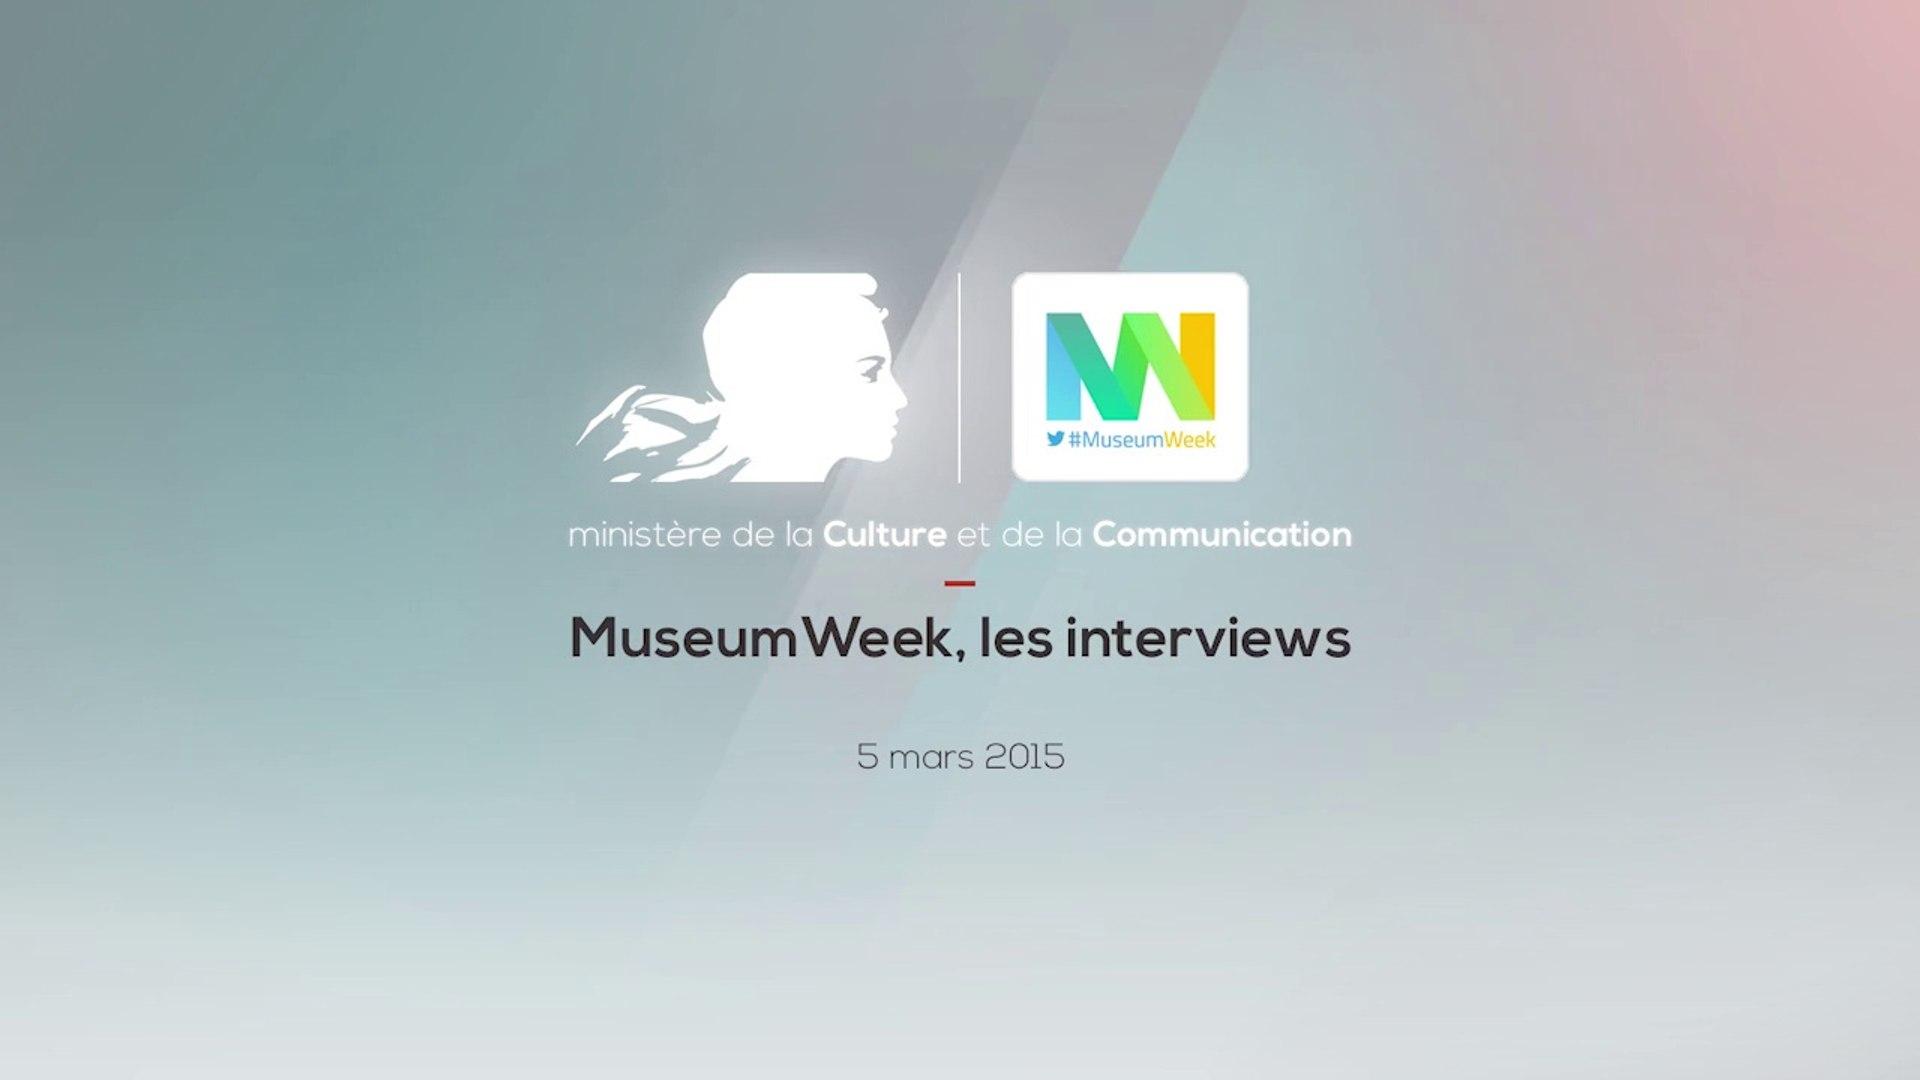 MuseumWeek 2015 - Les interviews